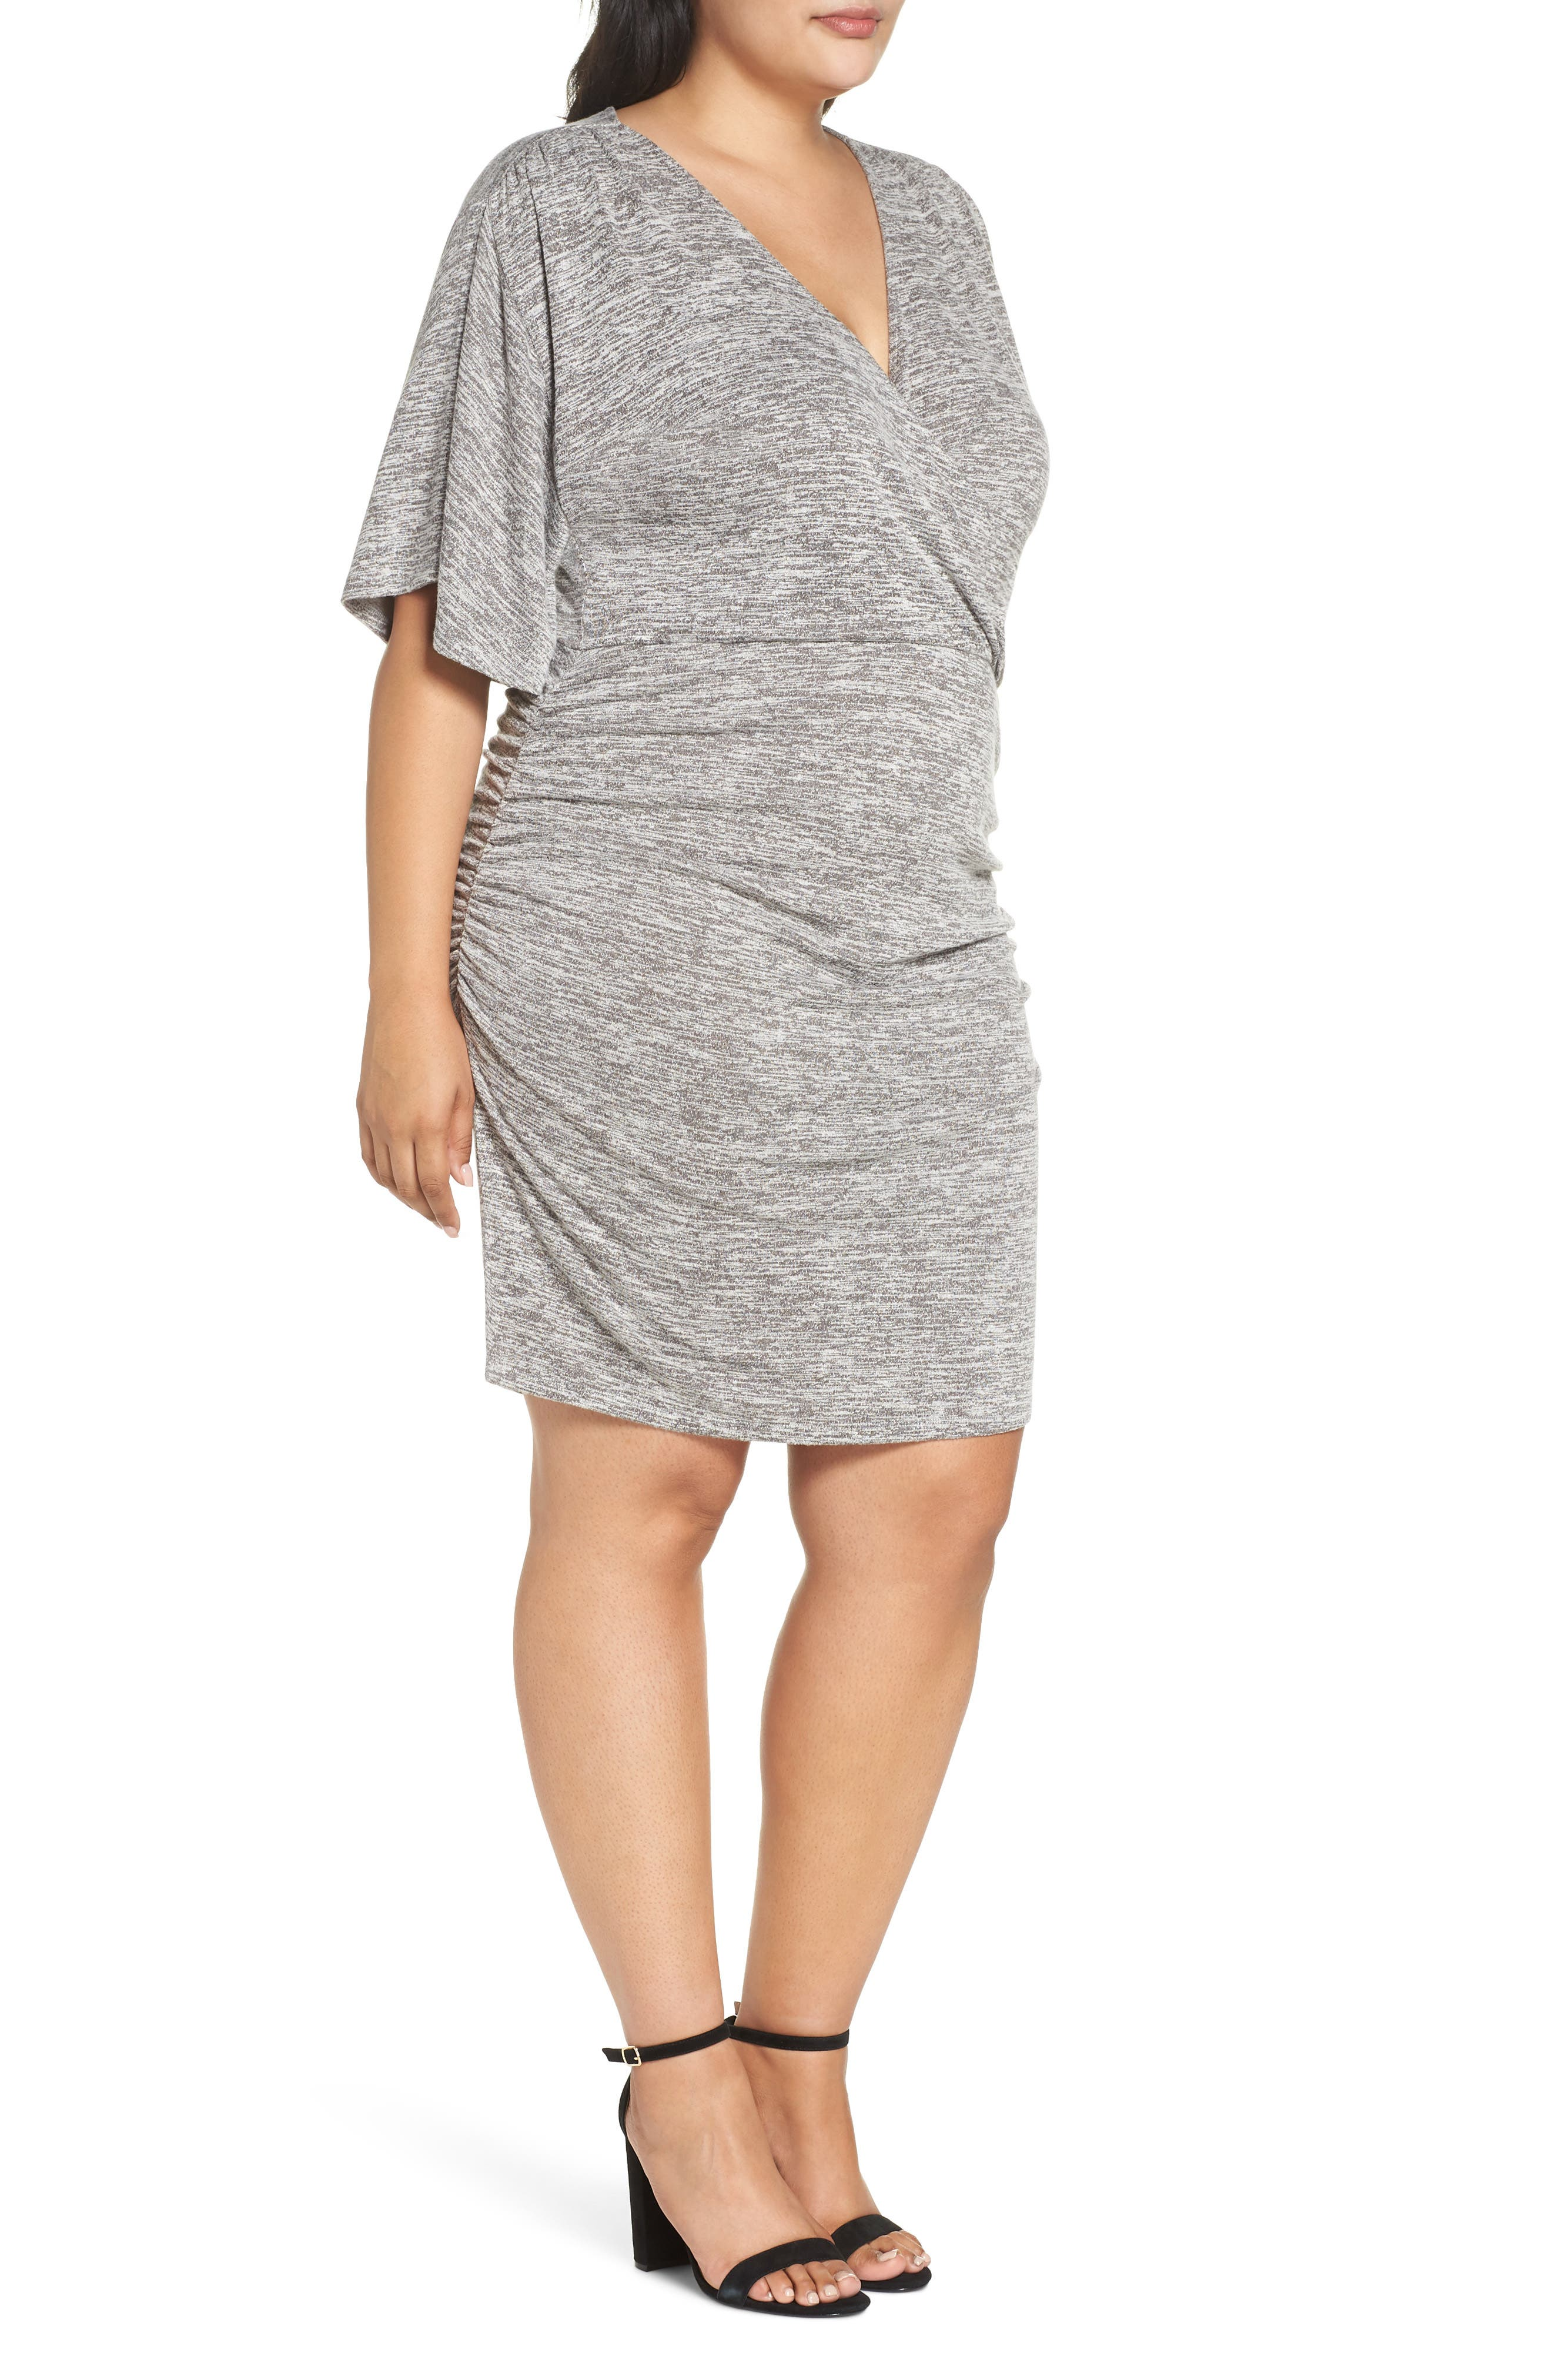 Wrap Dress,                             Alternate thumbnail 10, color,                             GREY CLOUDY HEATHER